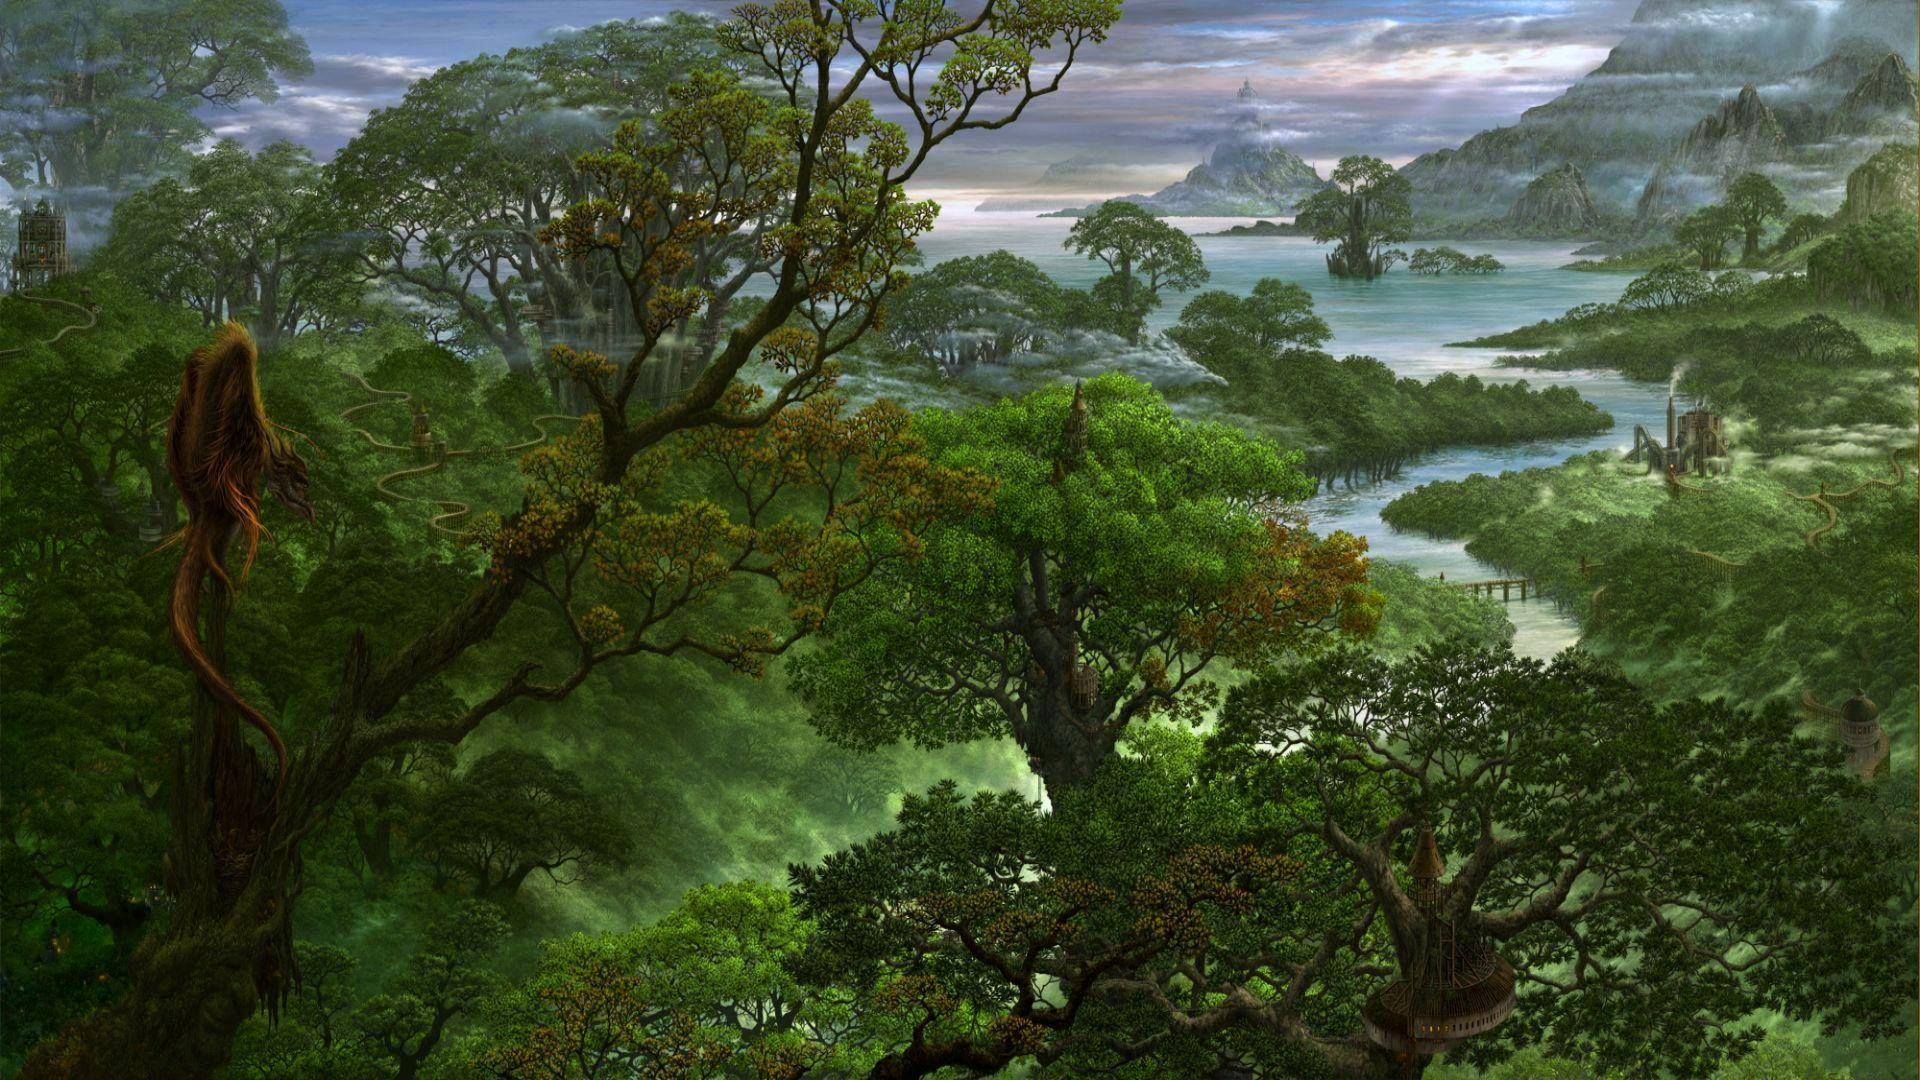 Drawn rainforest jungle landscape Art jungle wallpaper Fantasy wallpaper